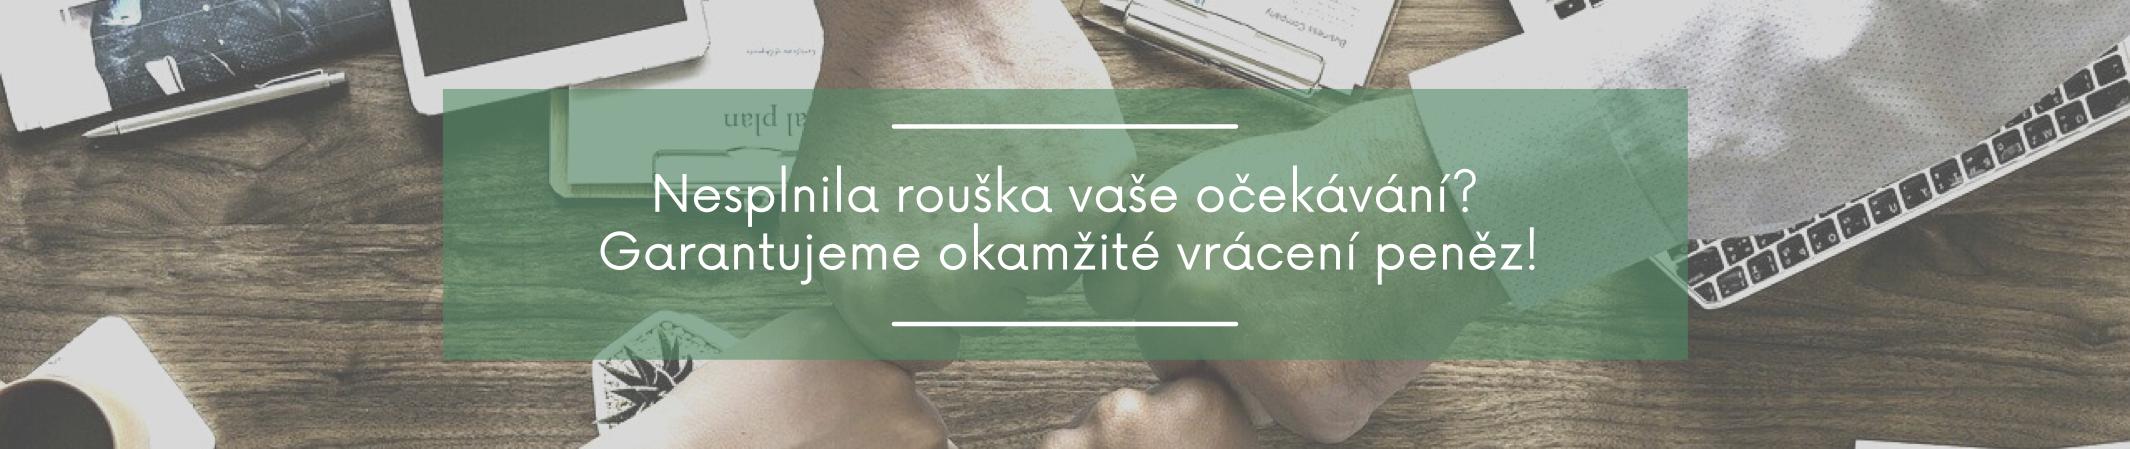 garance_vraceni_penez